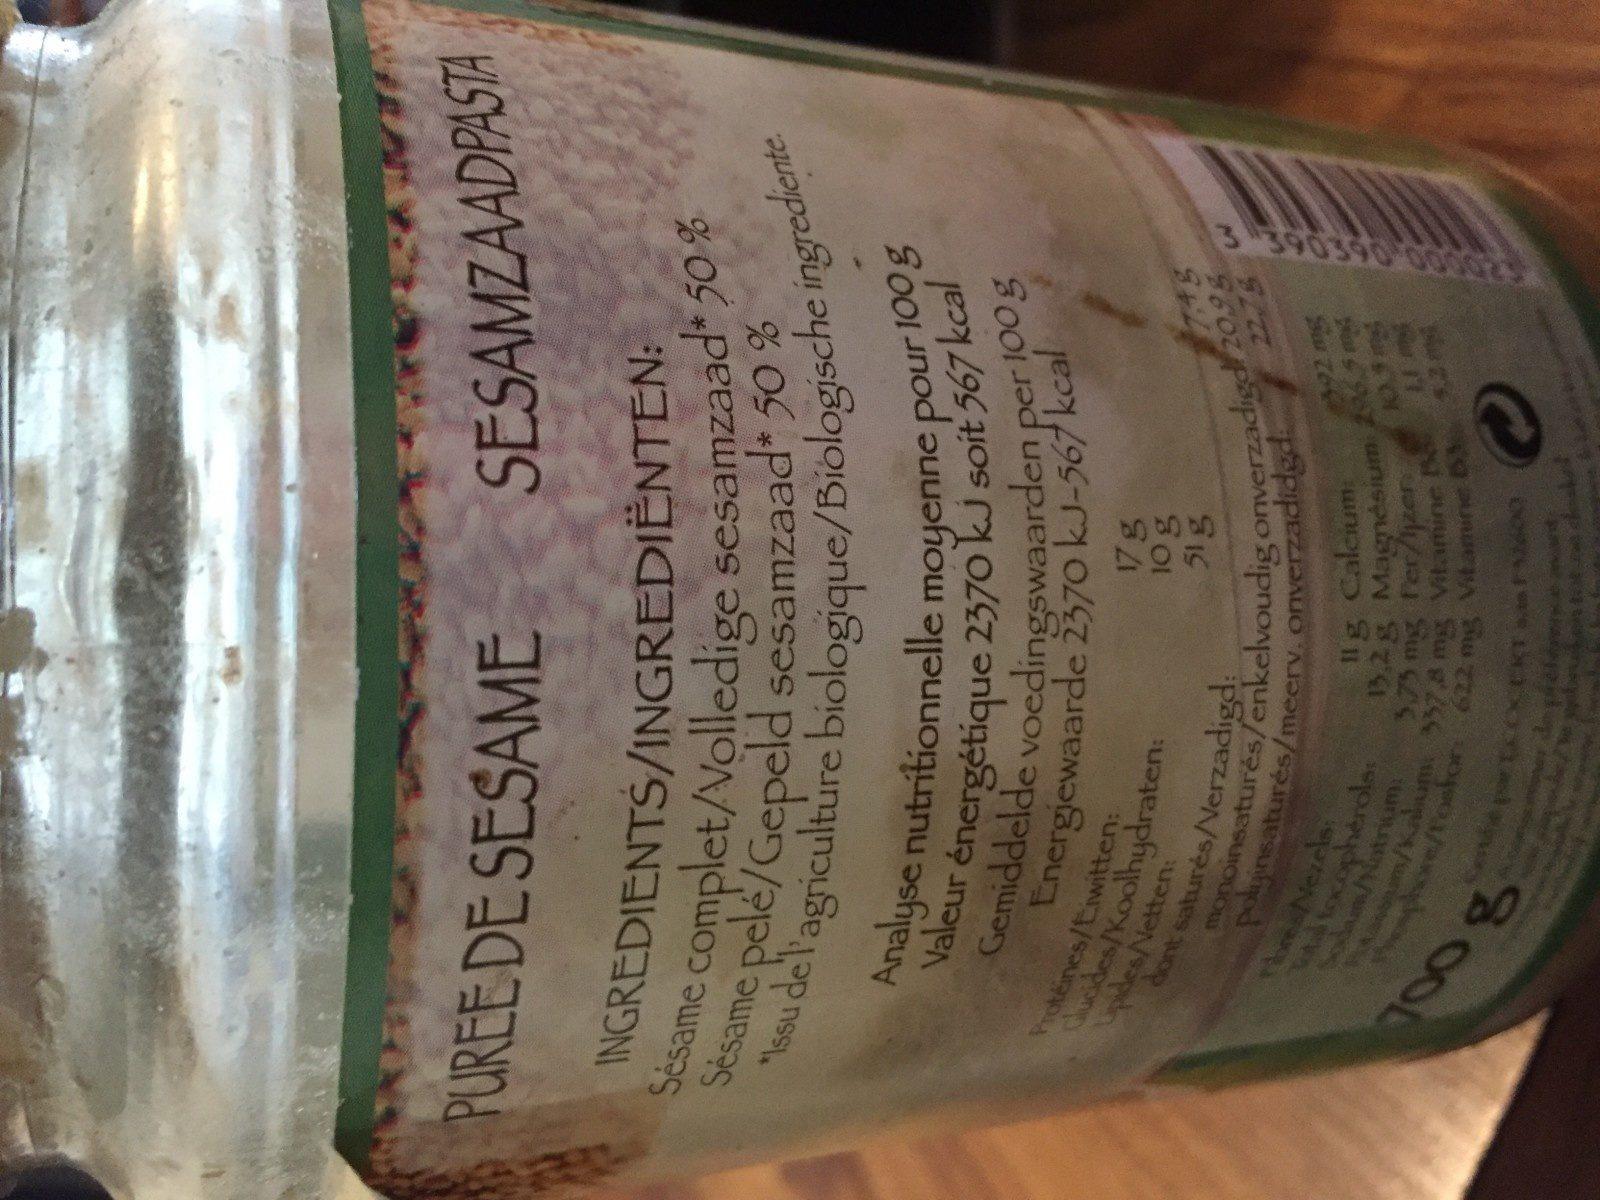 Puree de sesame - Ingredientes